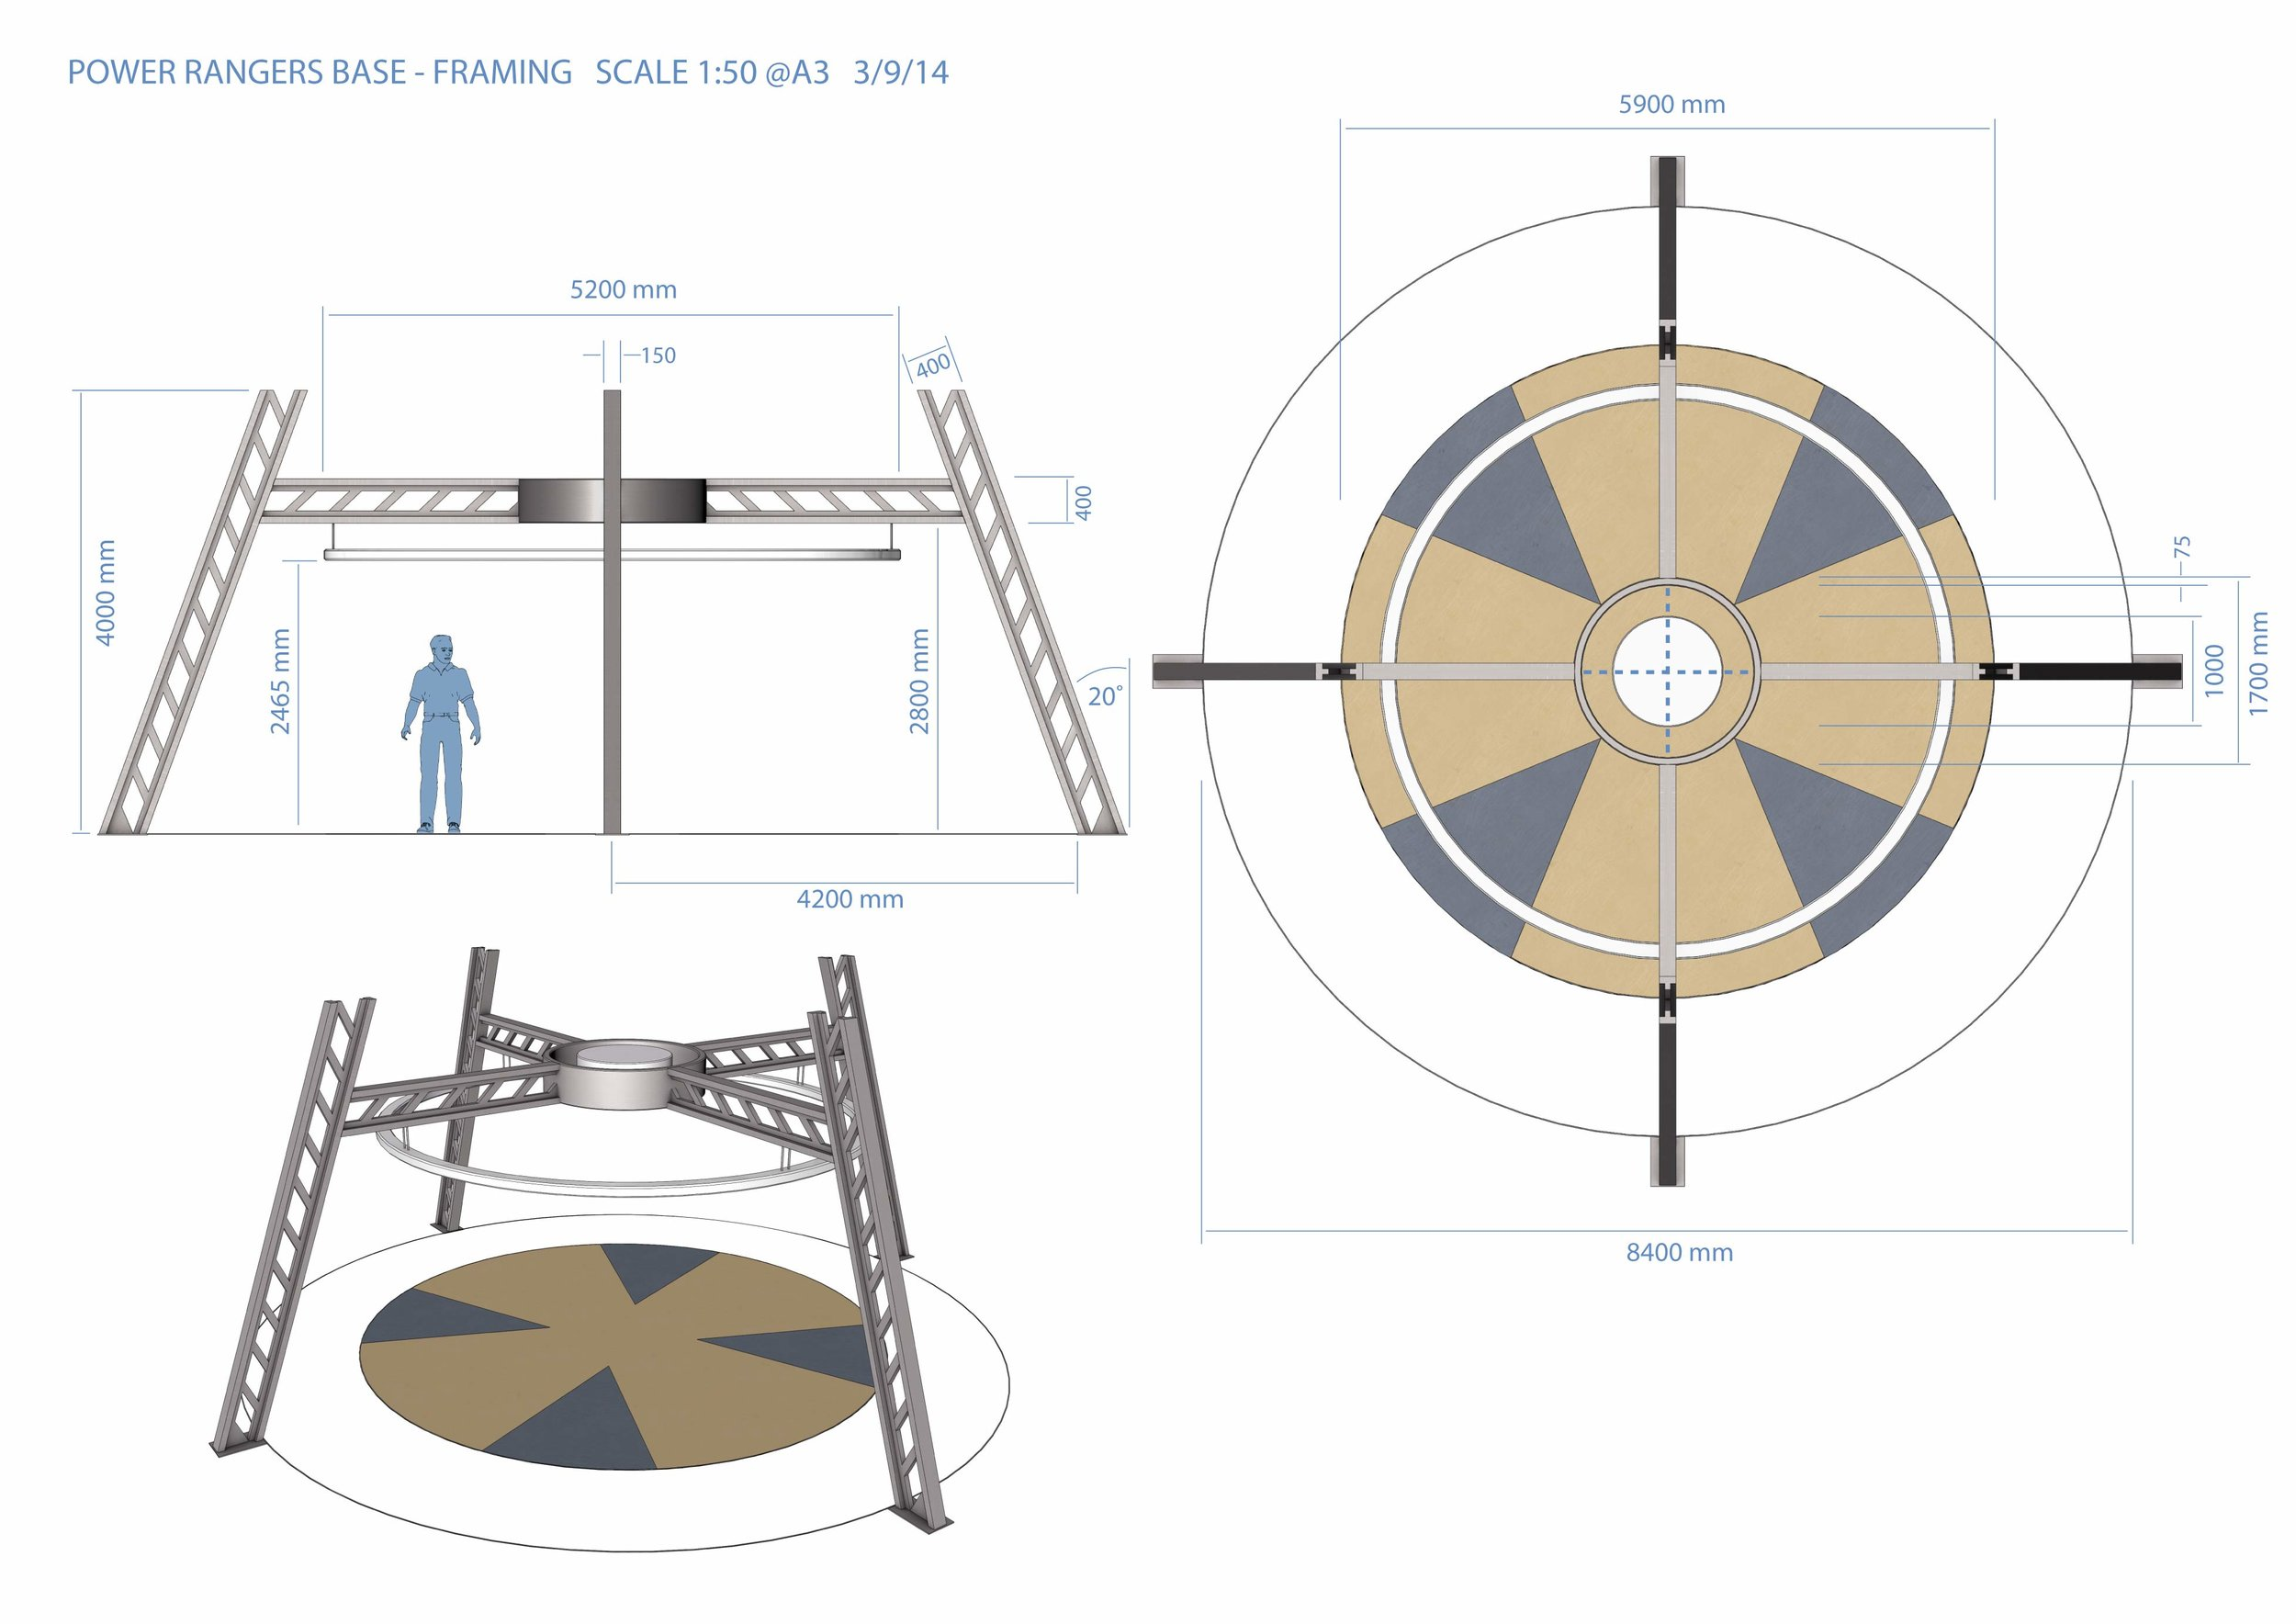 Power Ranger Base design detail drawings